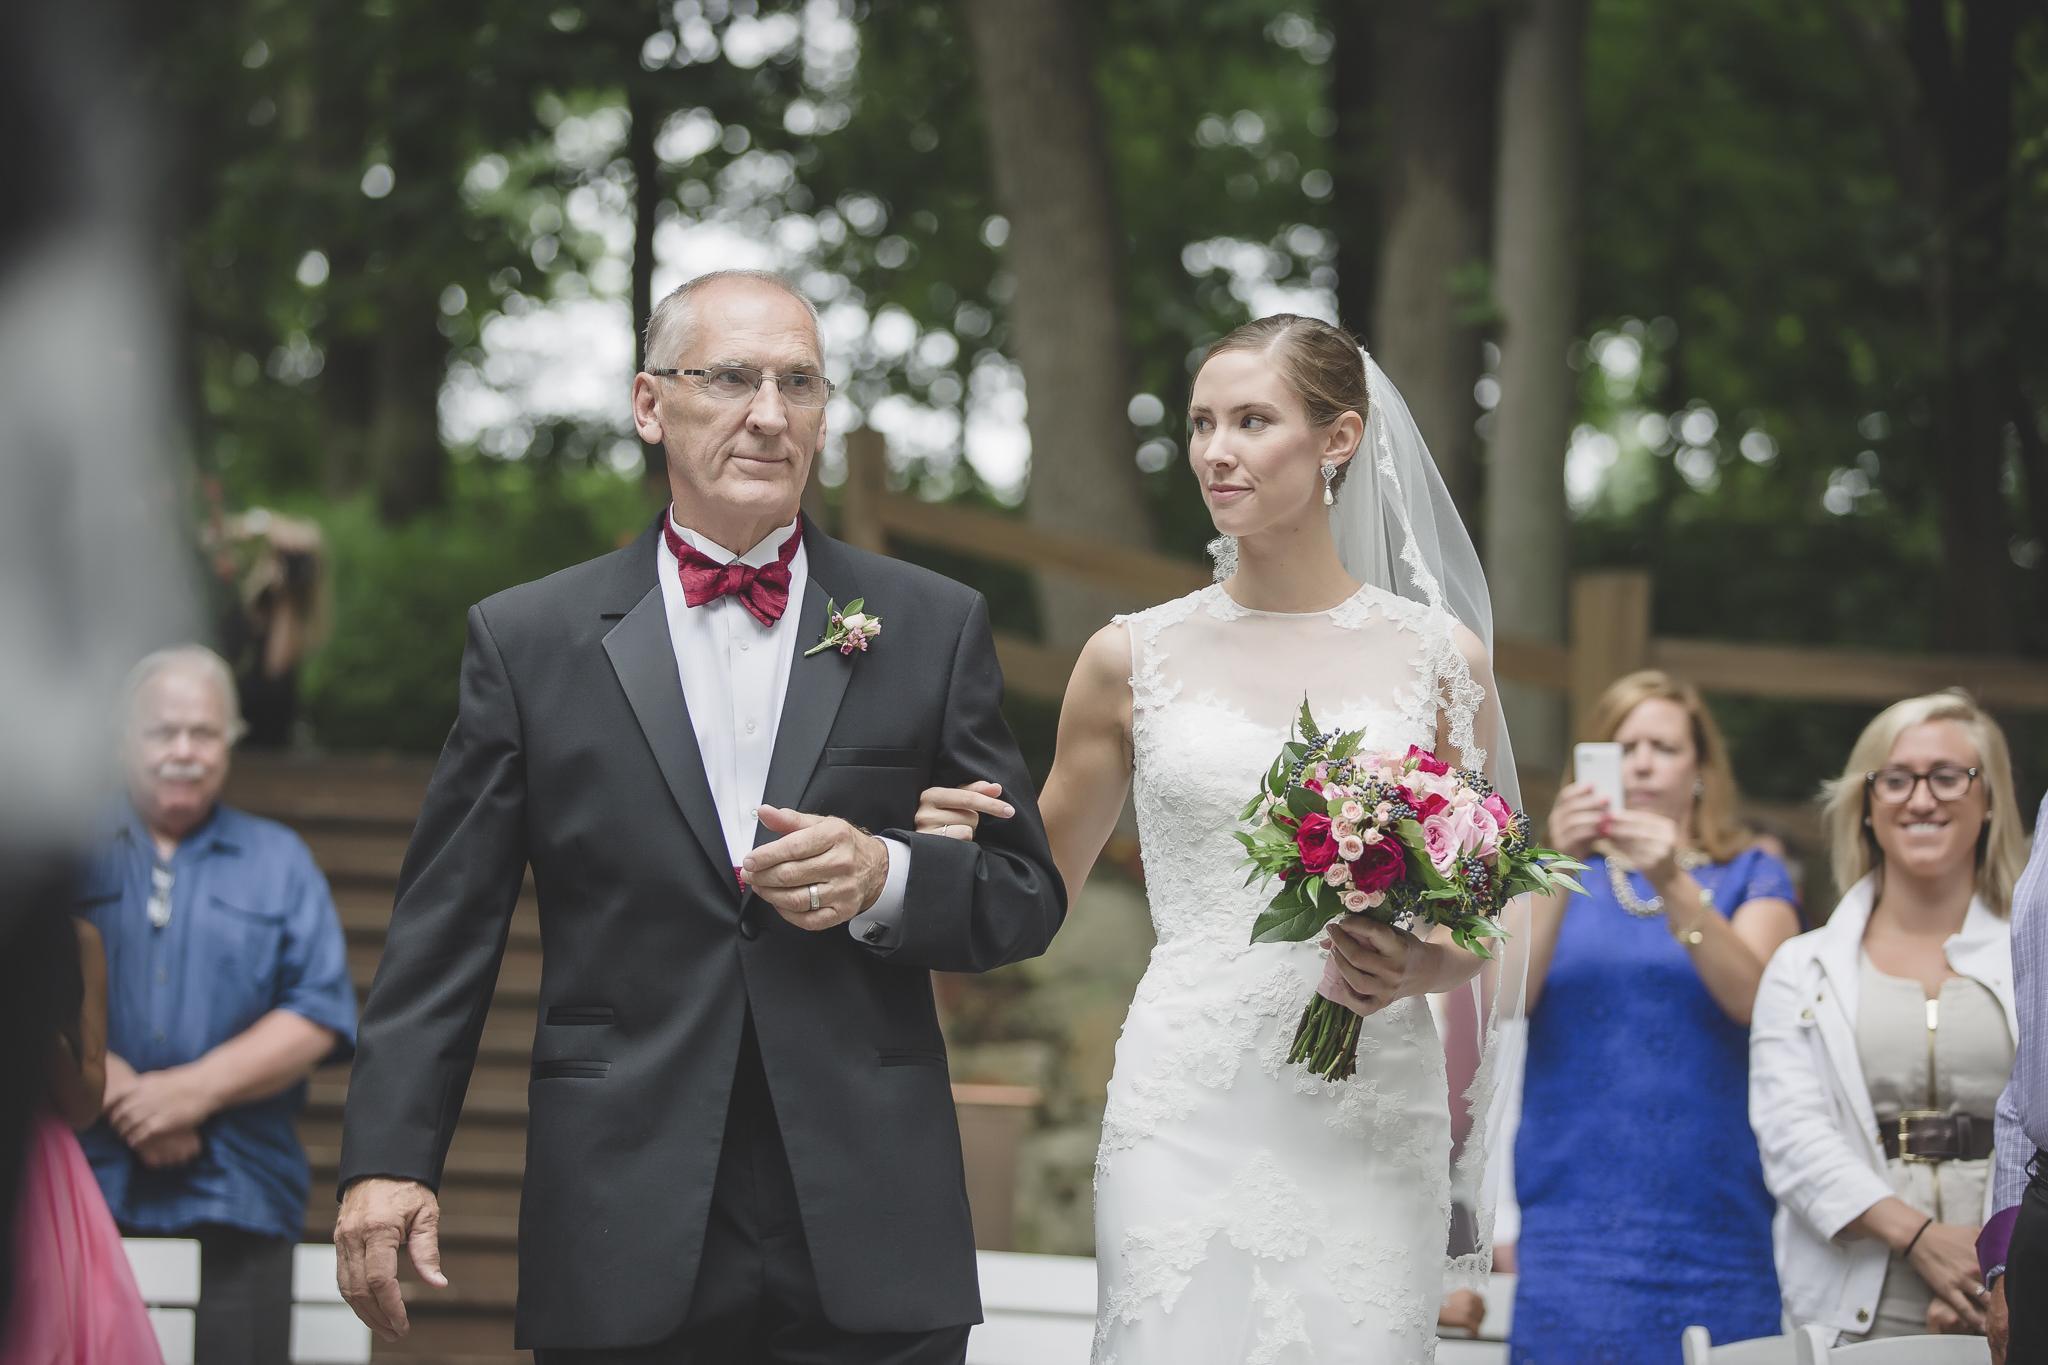 james j hill library wedding photography-11.jpg